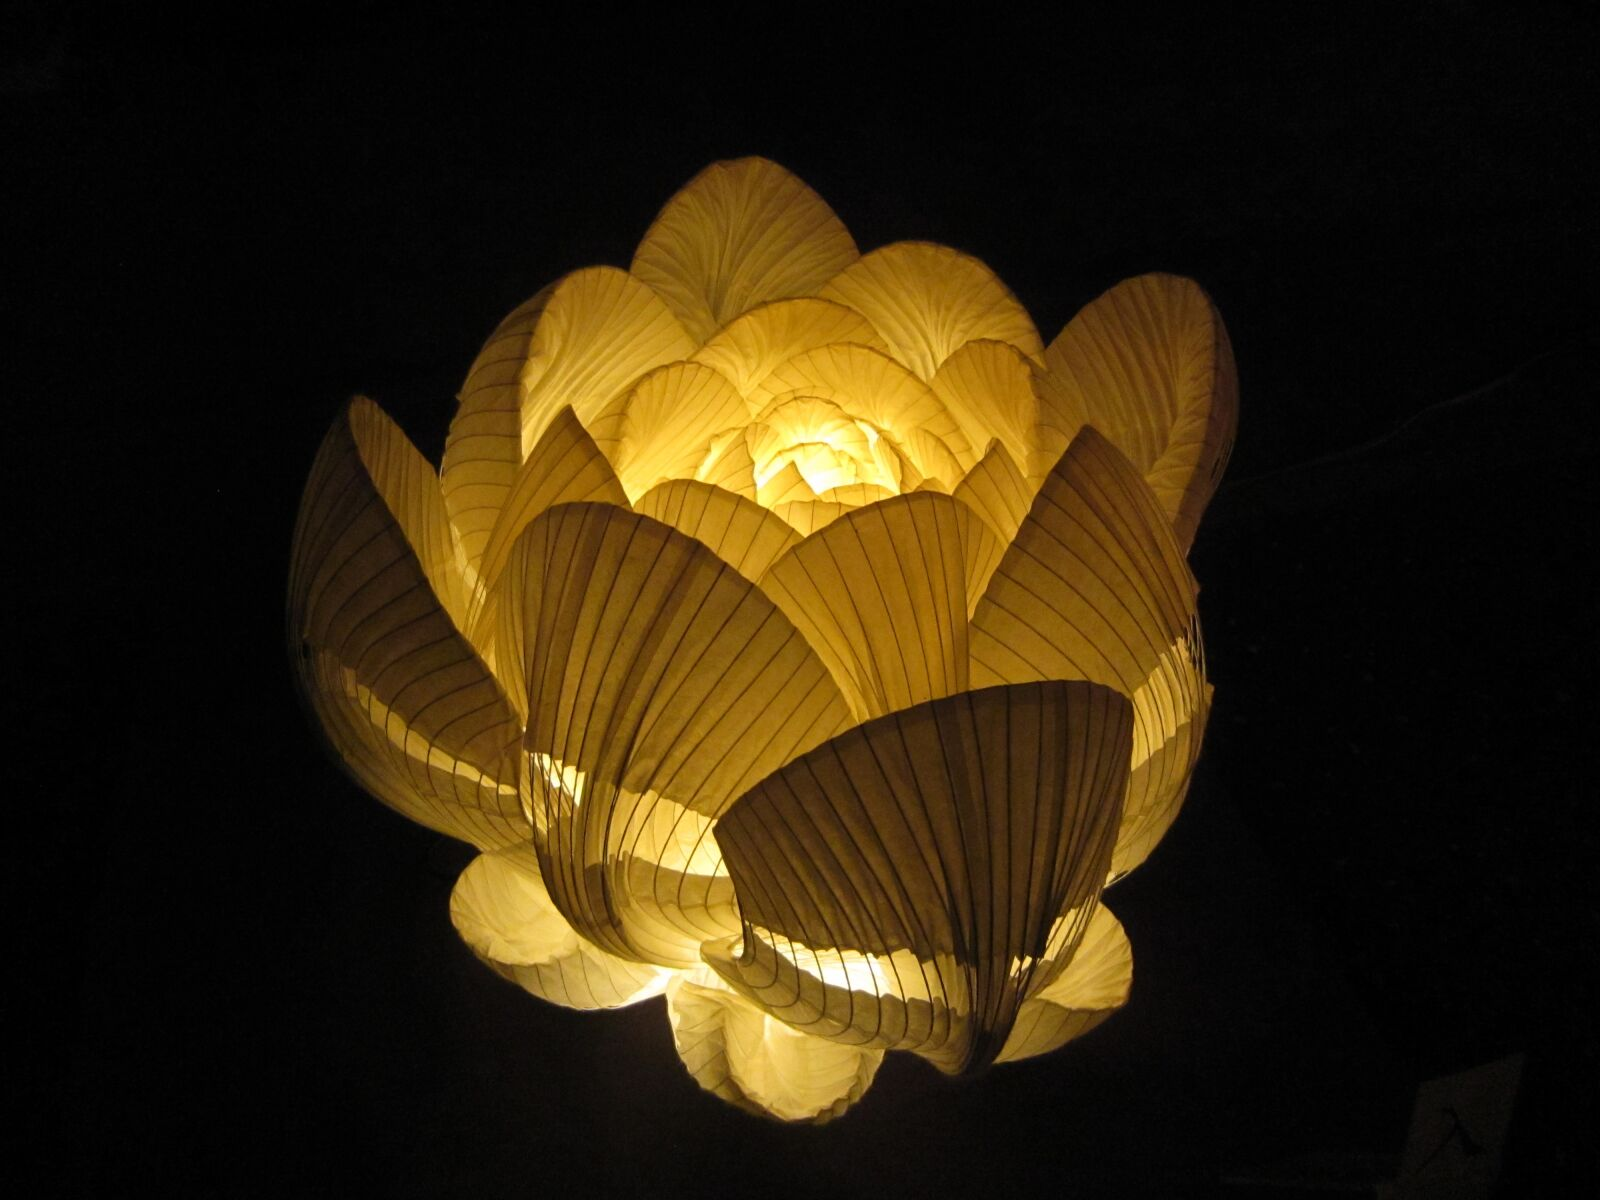 flowers, lamp, japanese paper